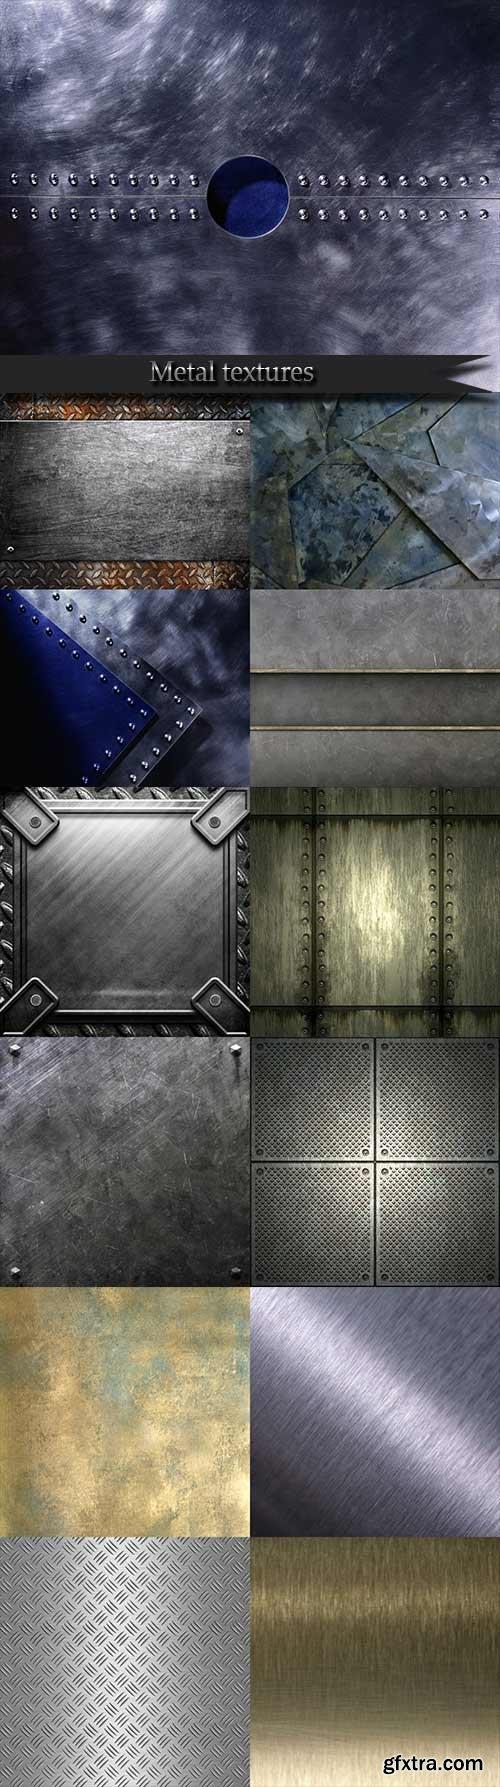 Metal textures for design